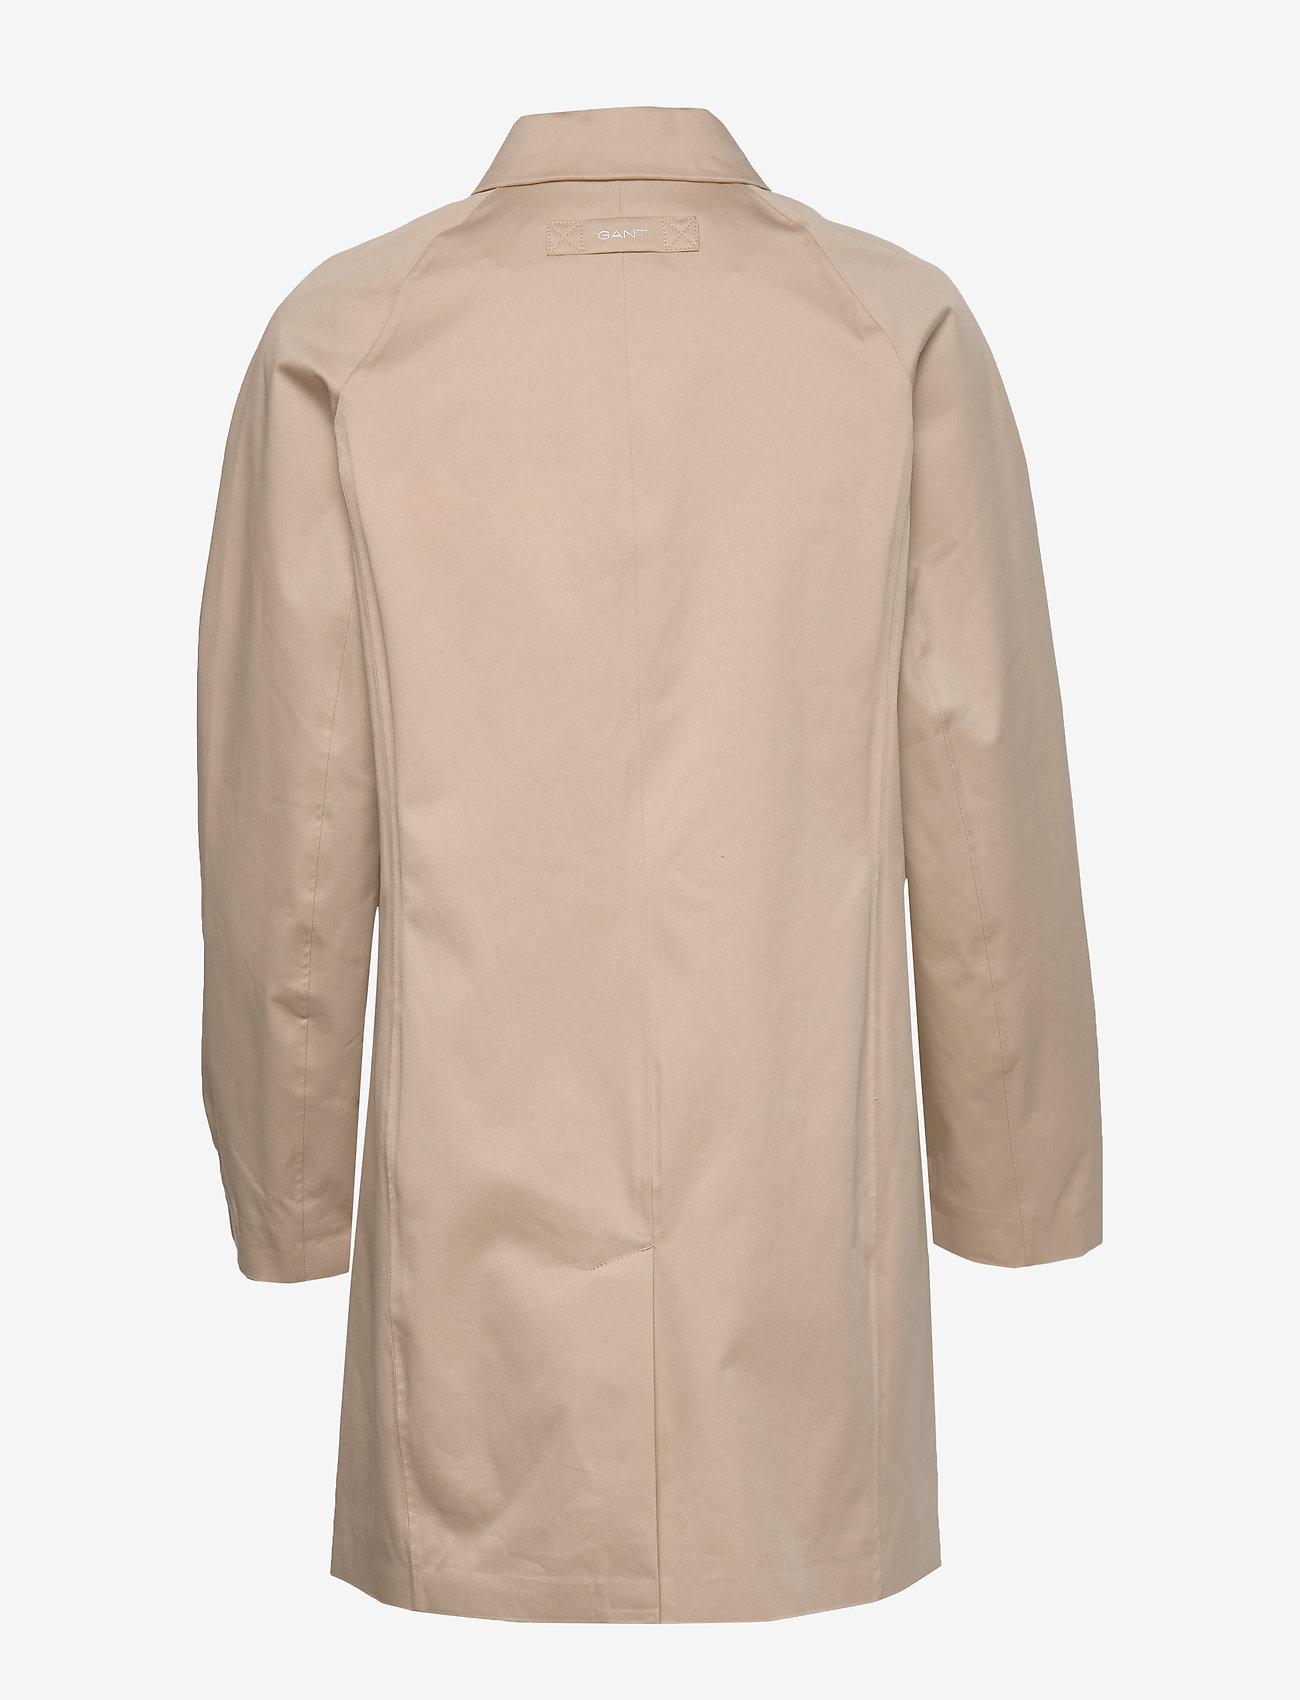 GANT - D1. TP RAIN MAC - cienkie płaszcze - dry sand - 1